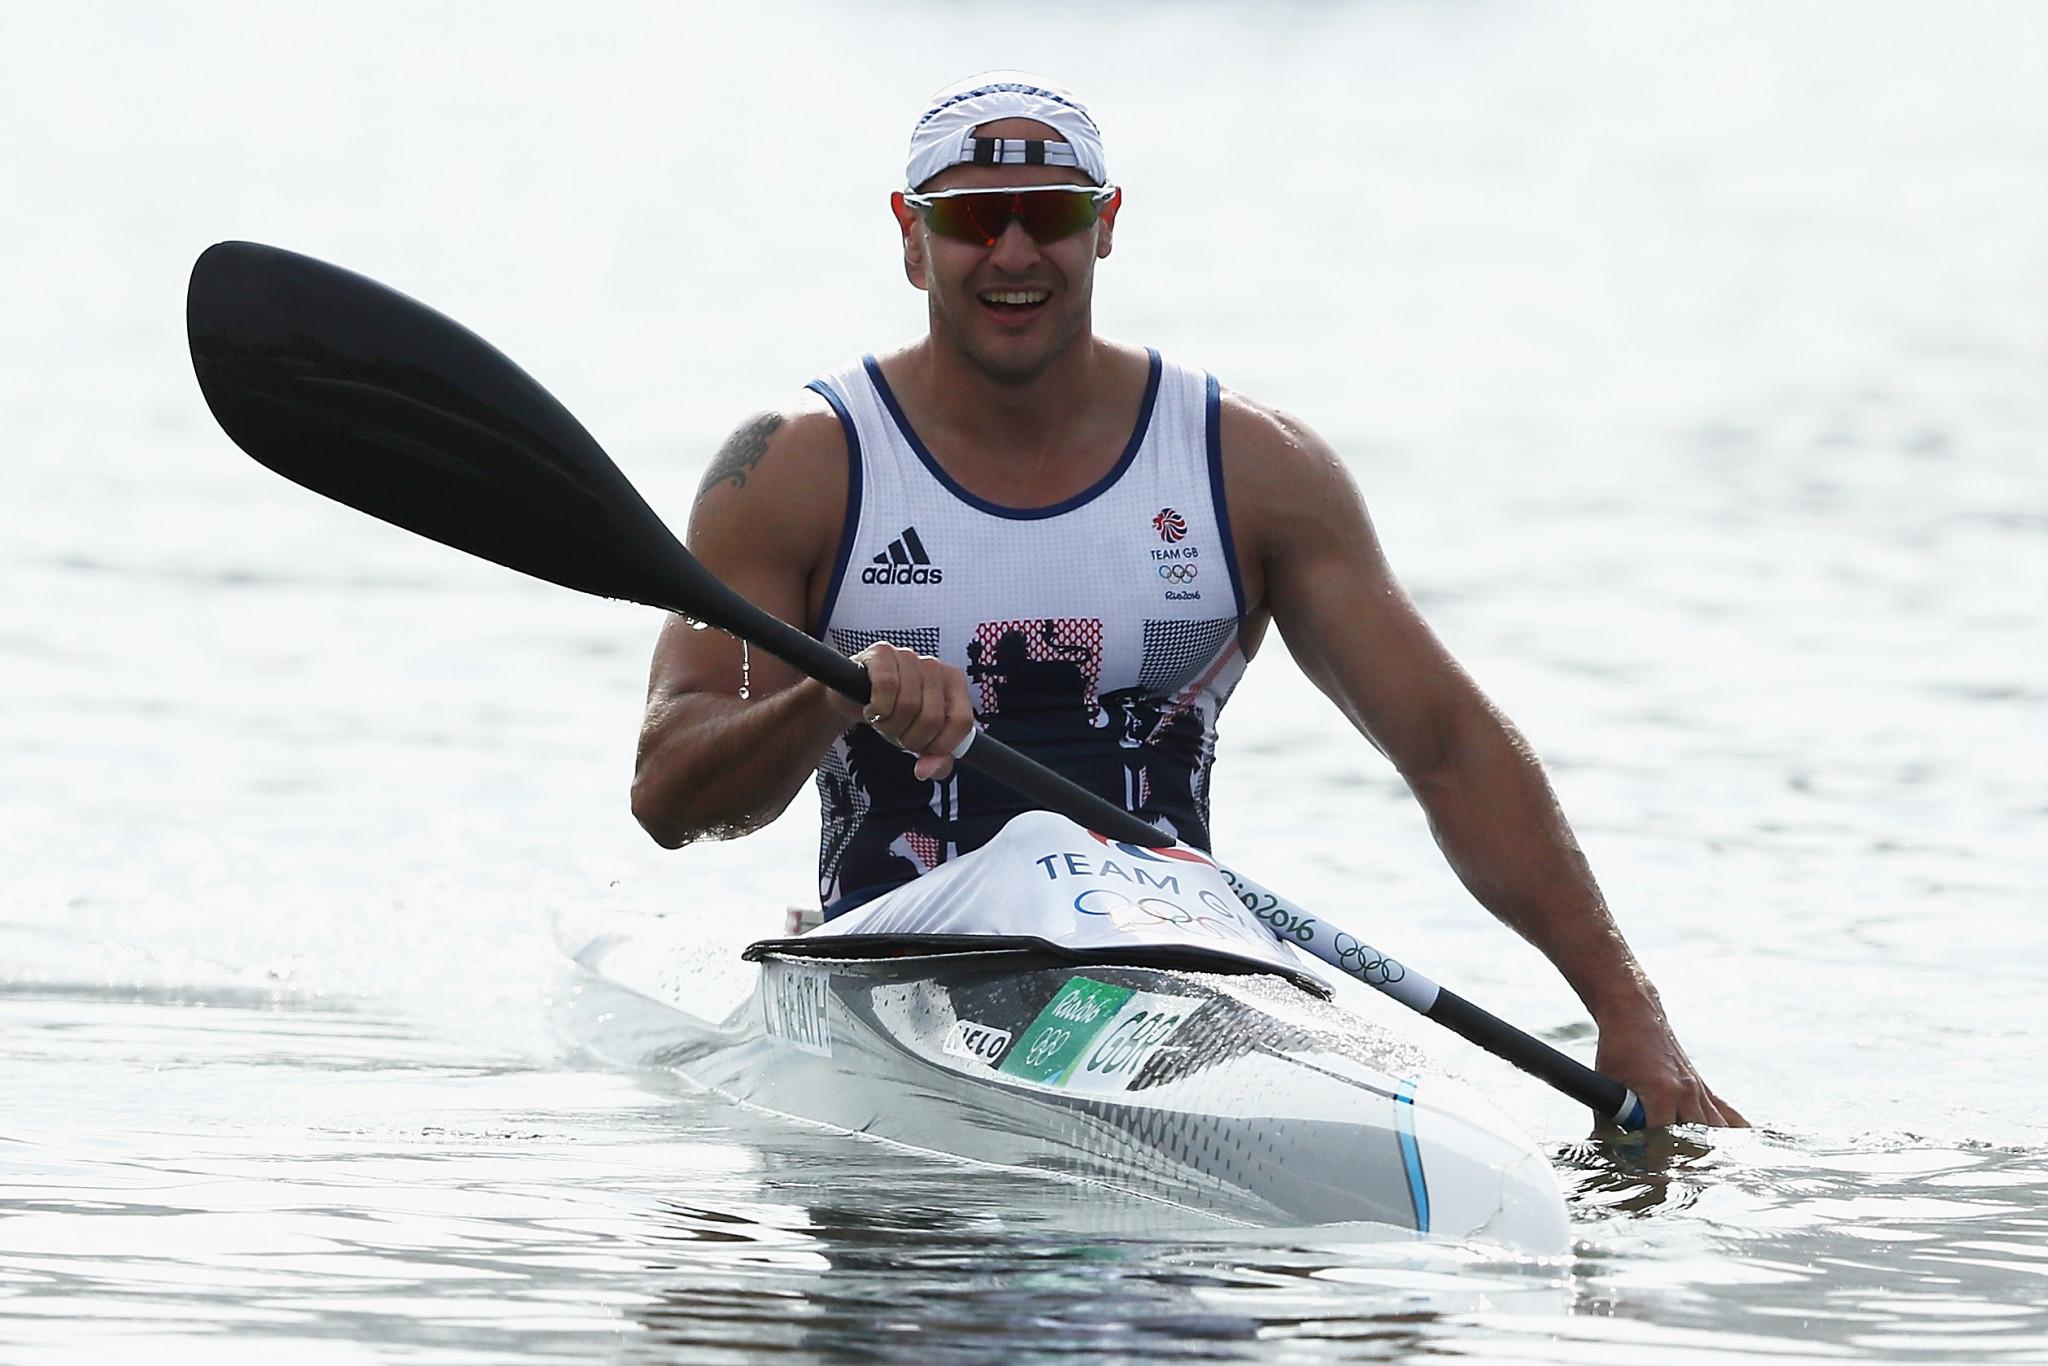 Liam Heath won the men's K1 200m today ©Getty Images